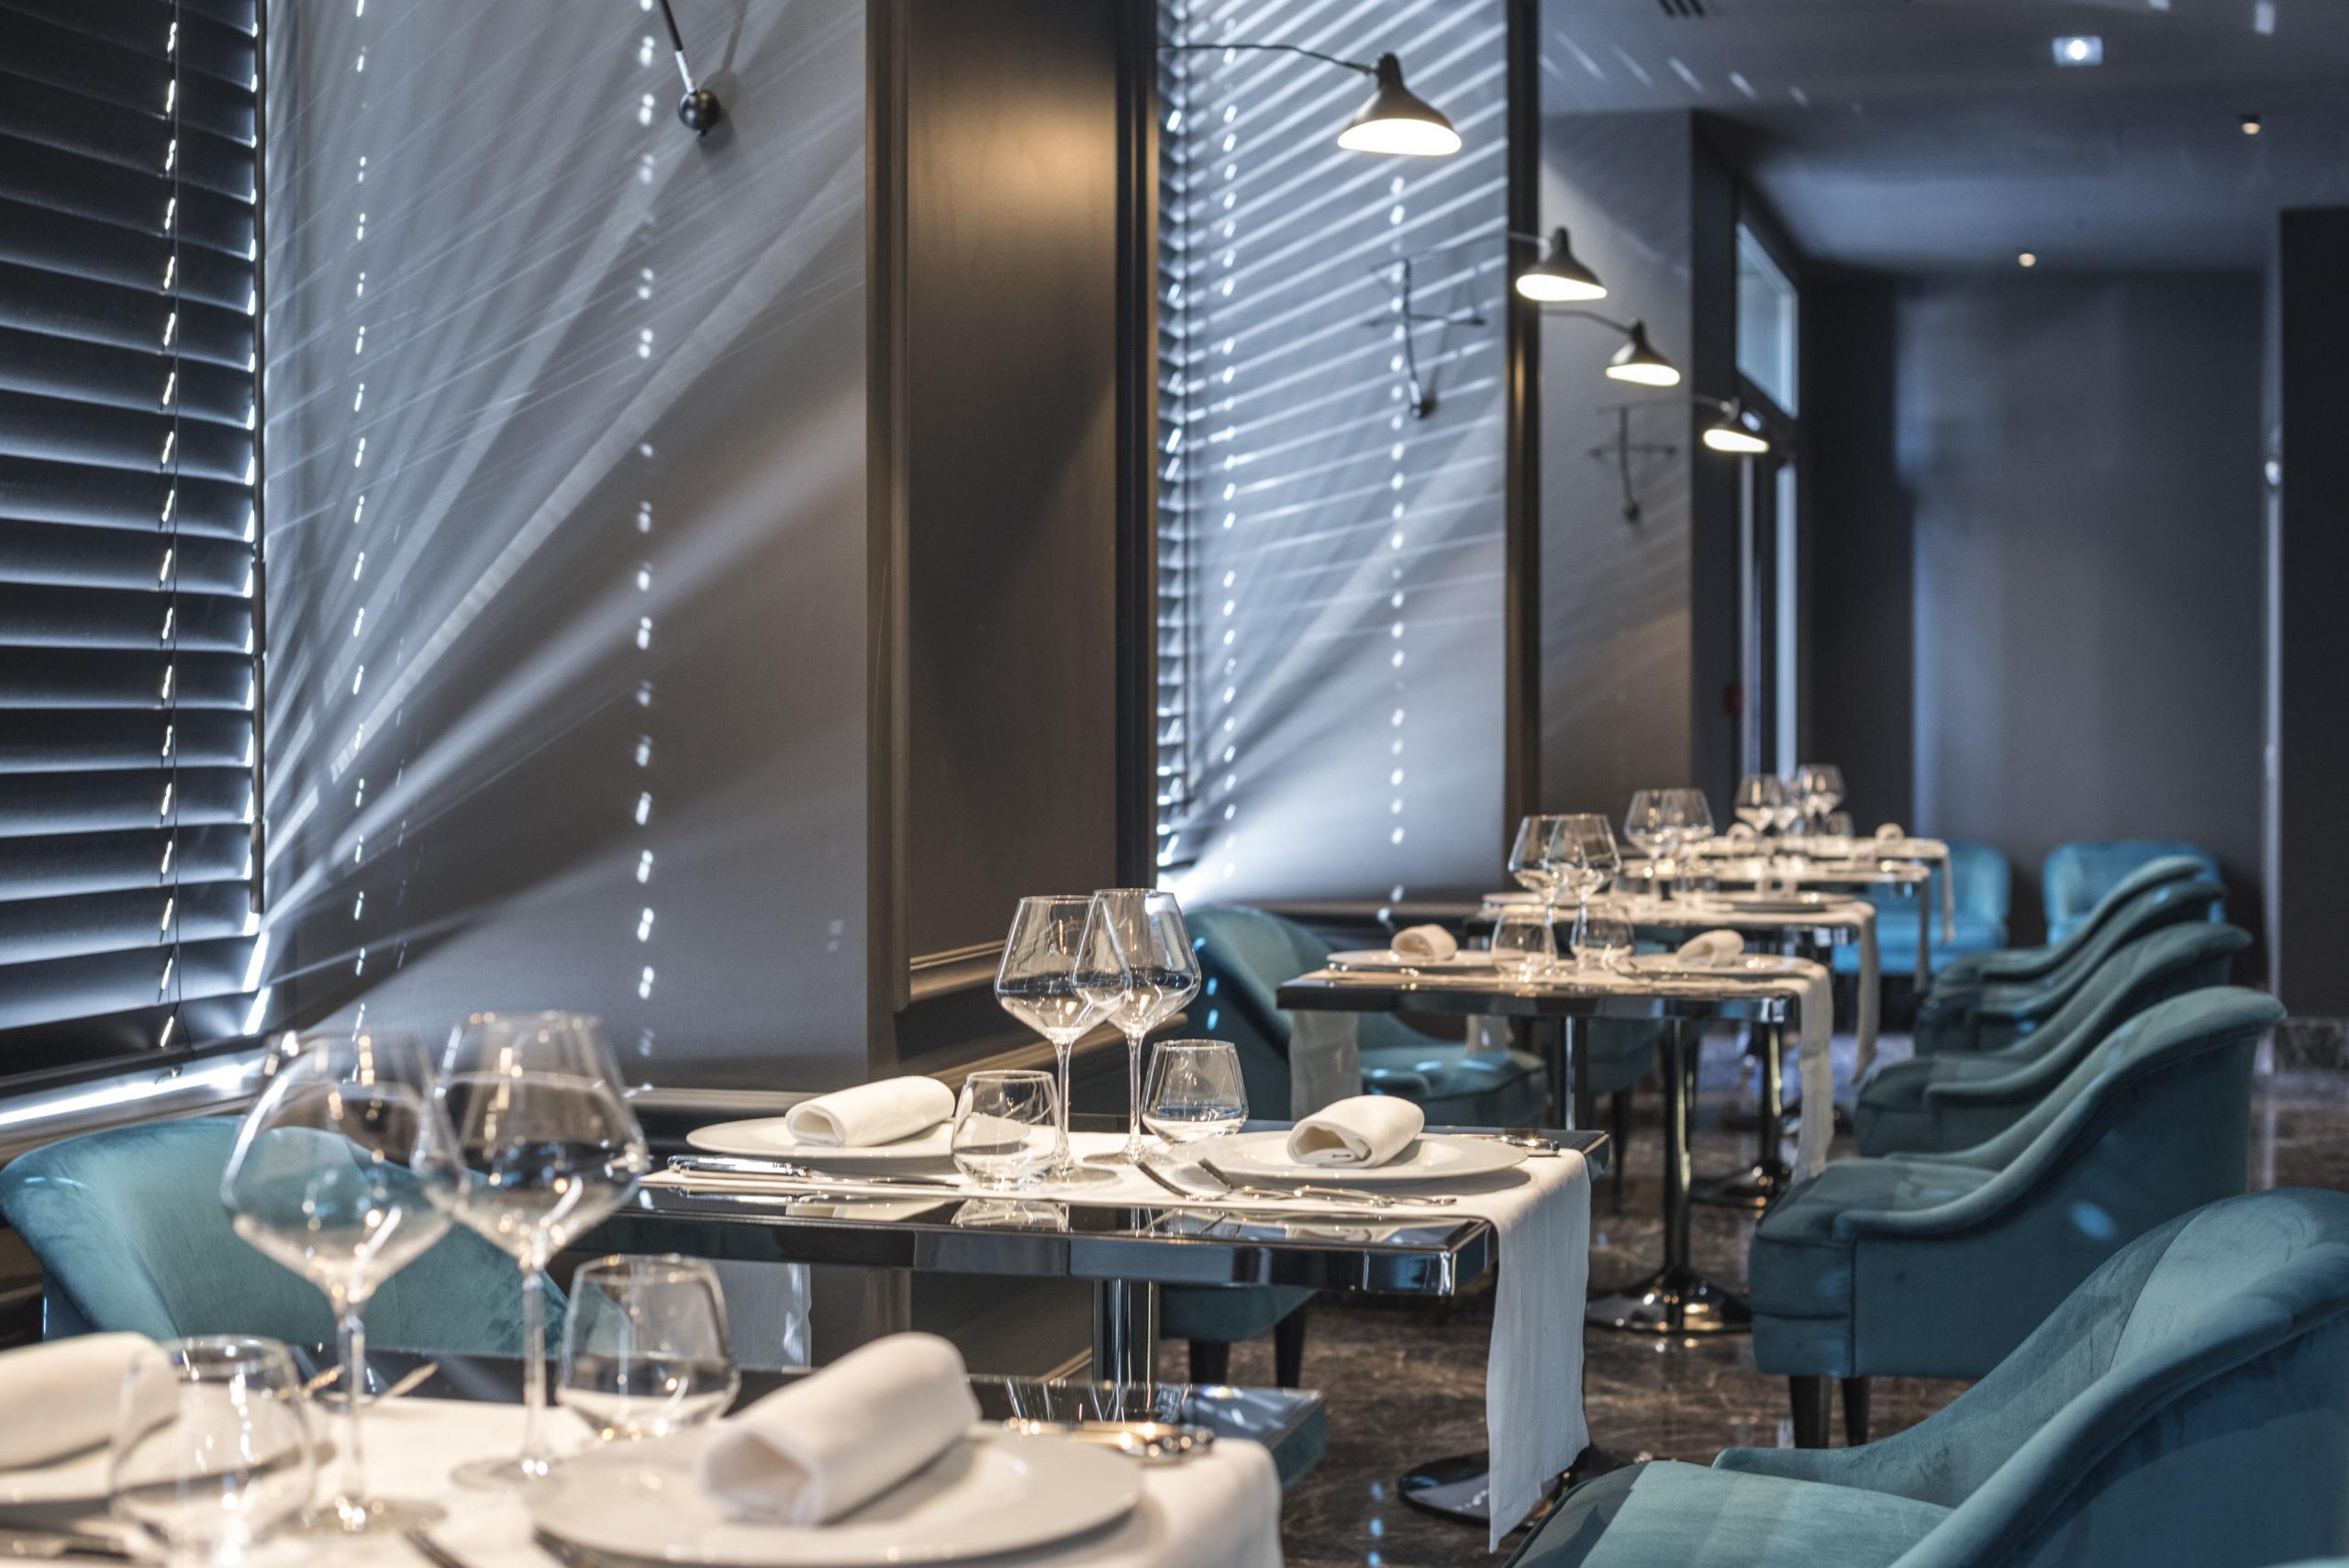 hôtel Boscolo Lyon 2 table restaurant 2